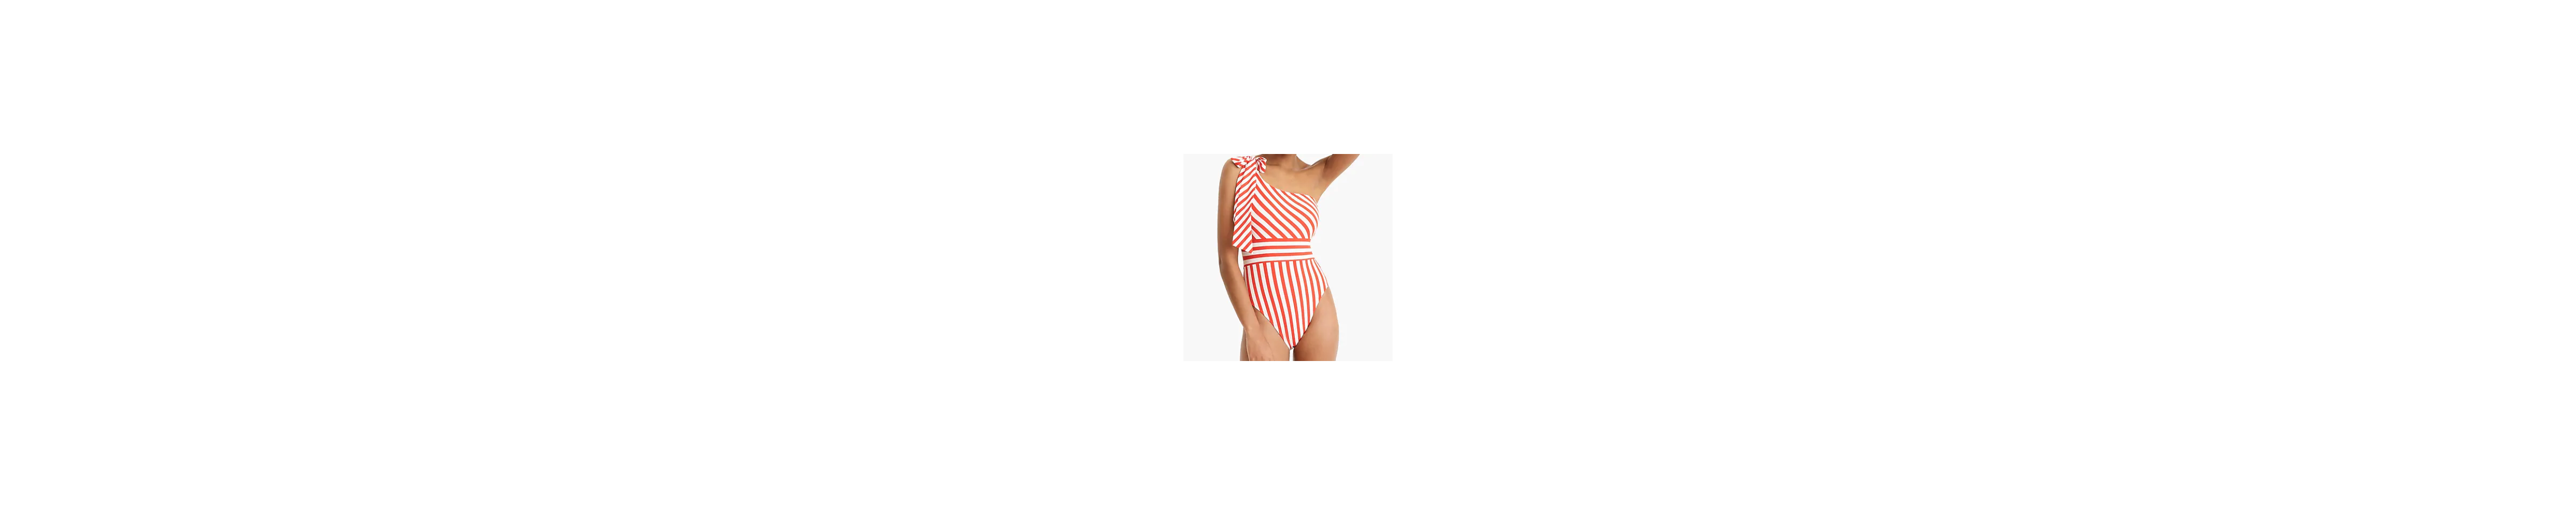 Jcrew swimsuit